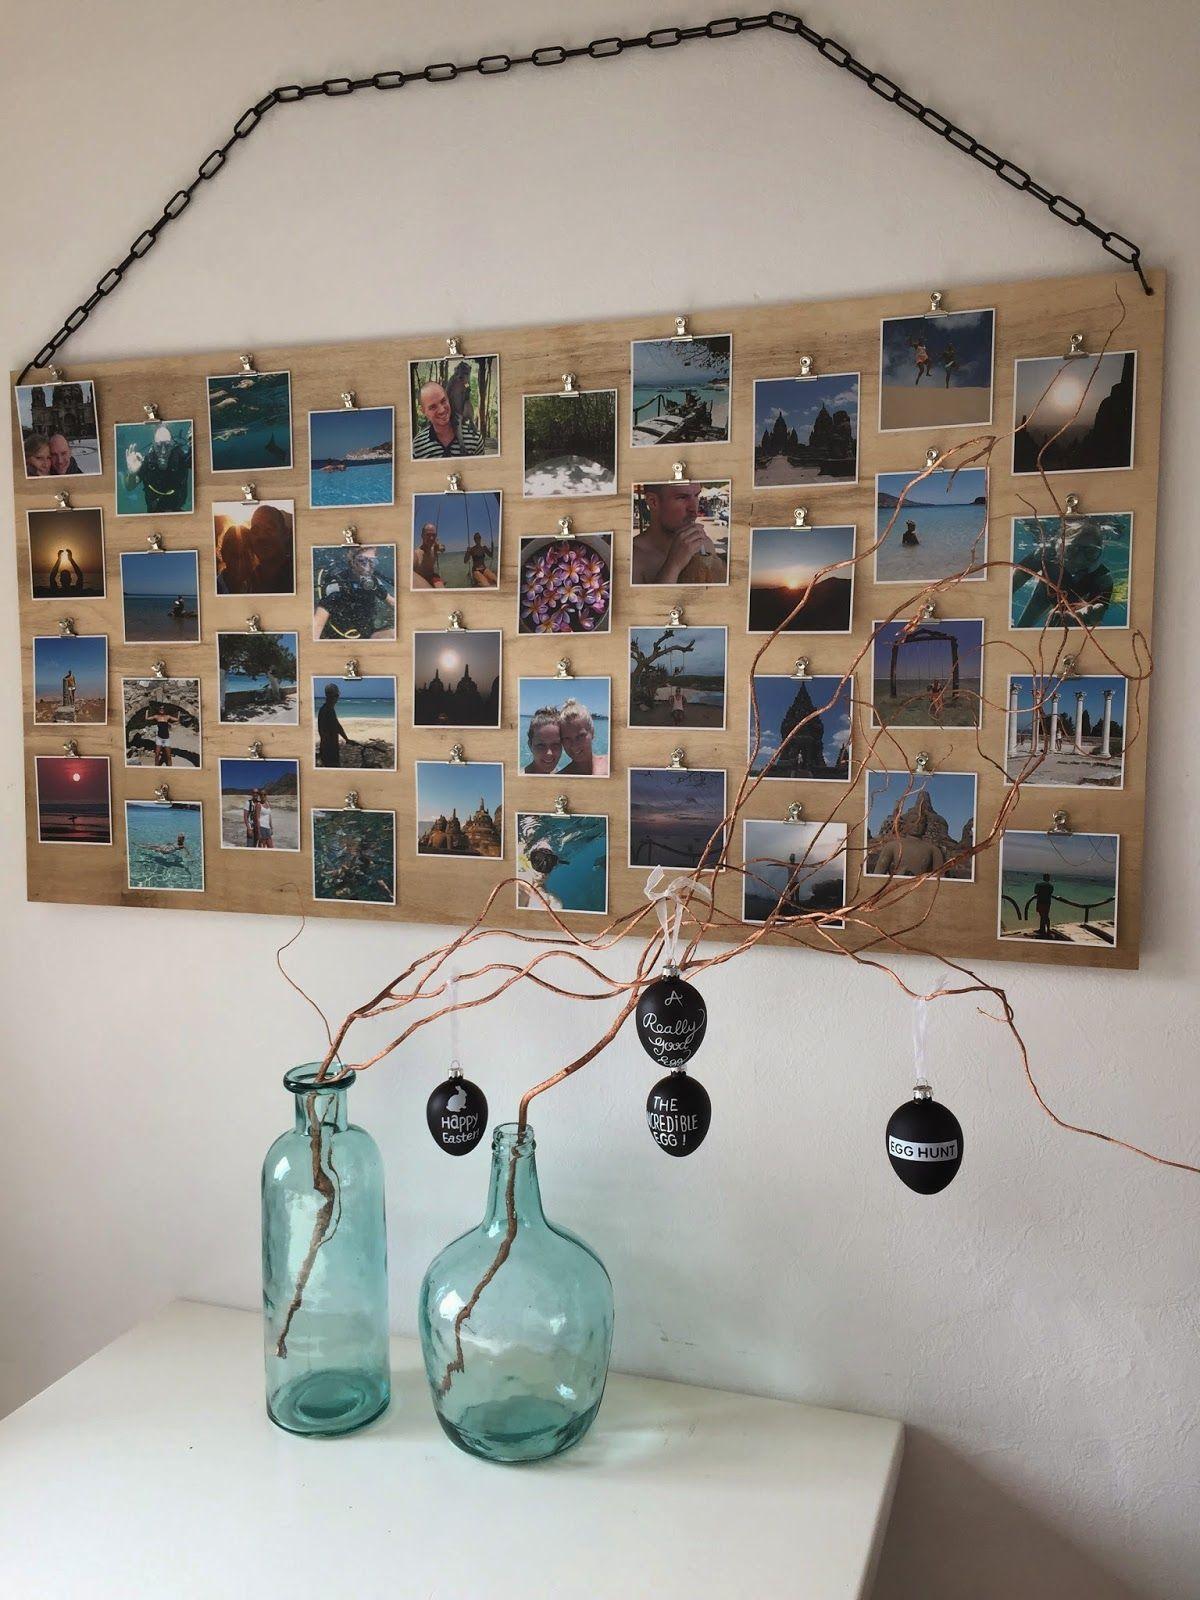 diy fotobord met clips woonideeen pinterest huiskamer muur en slaapkamer. Black Bedroom Furniture Sets. Home Design Ideas